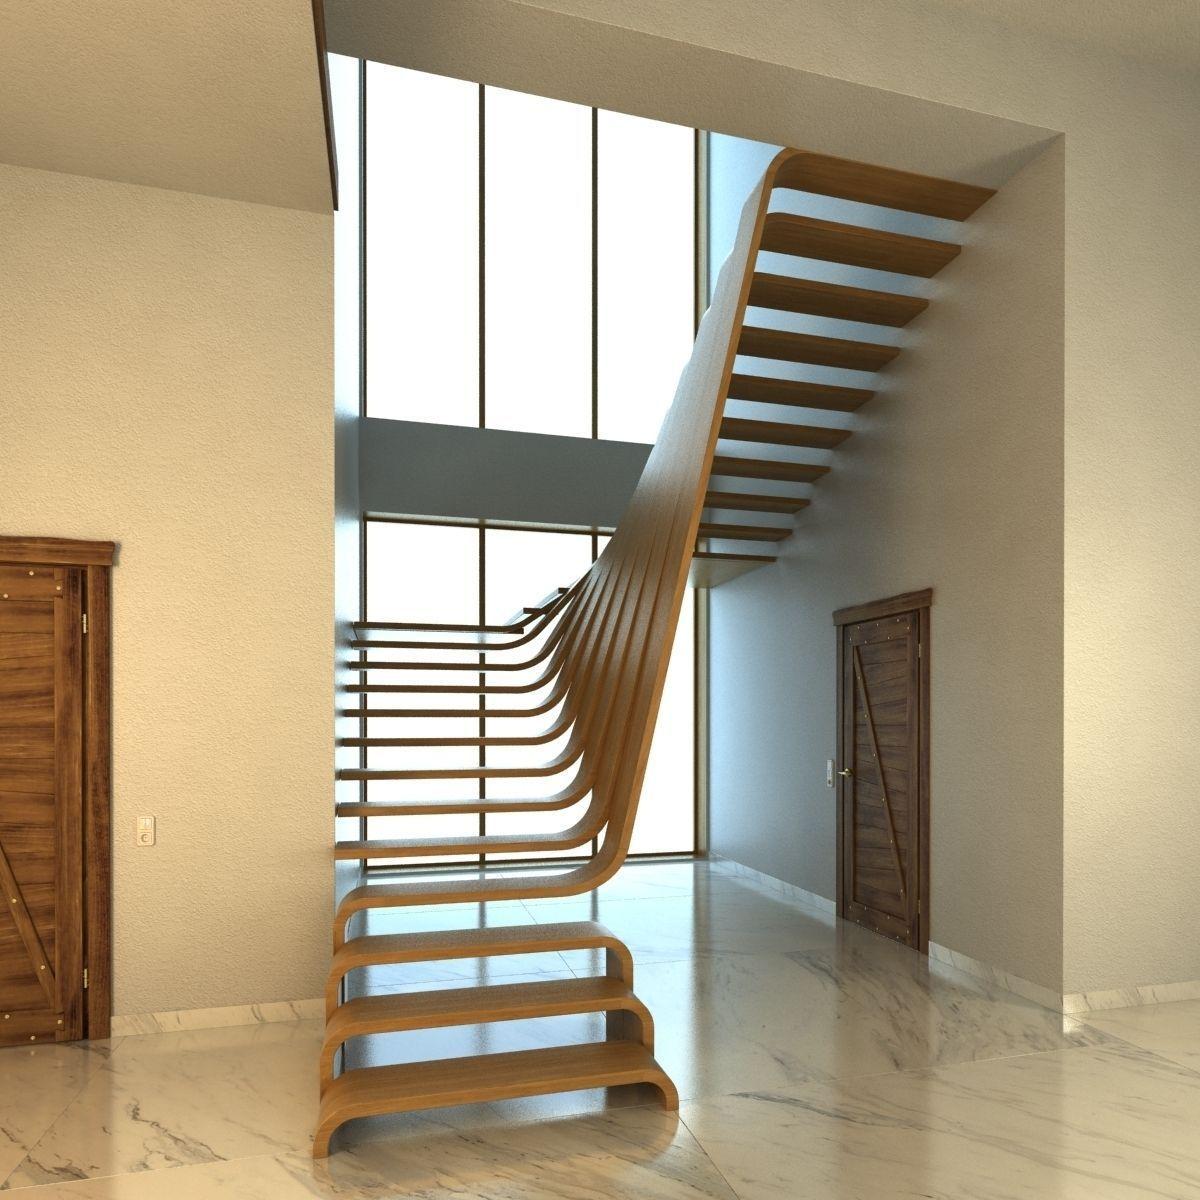 Creative wood stairs scene